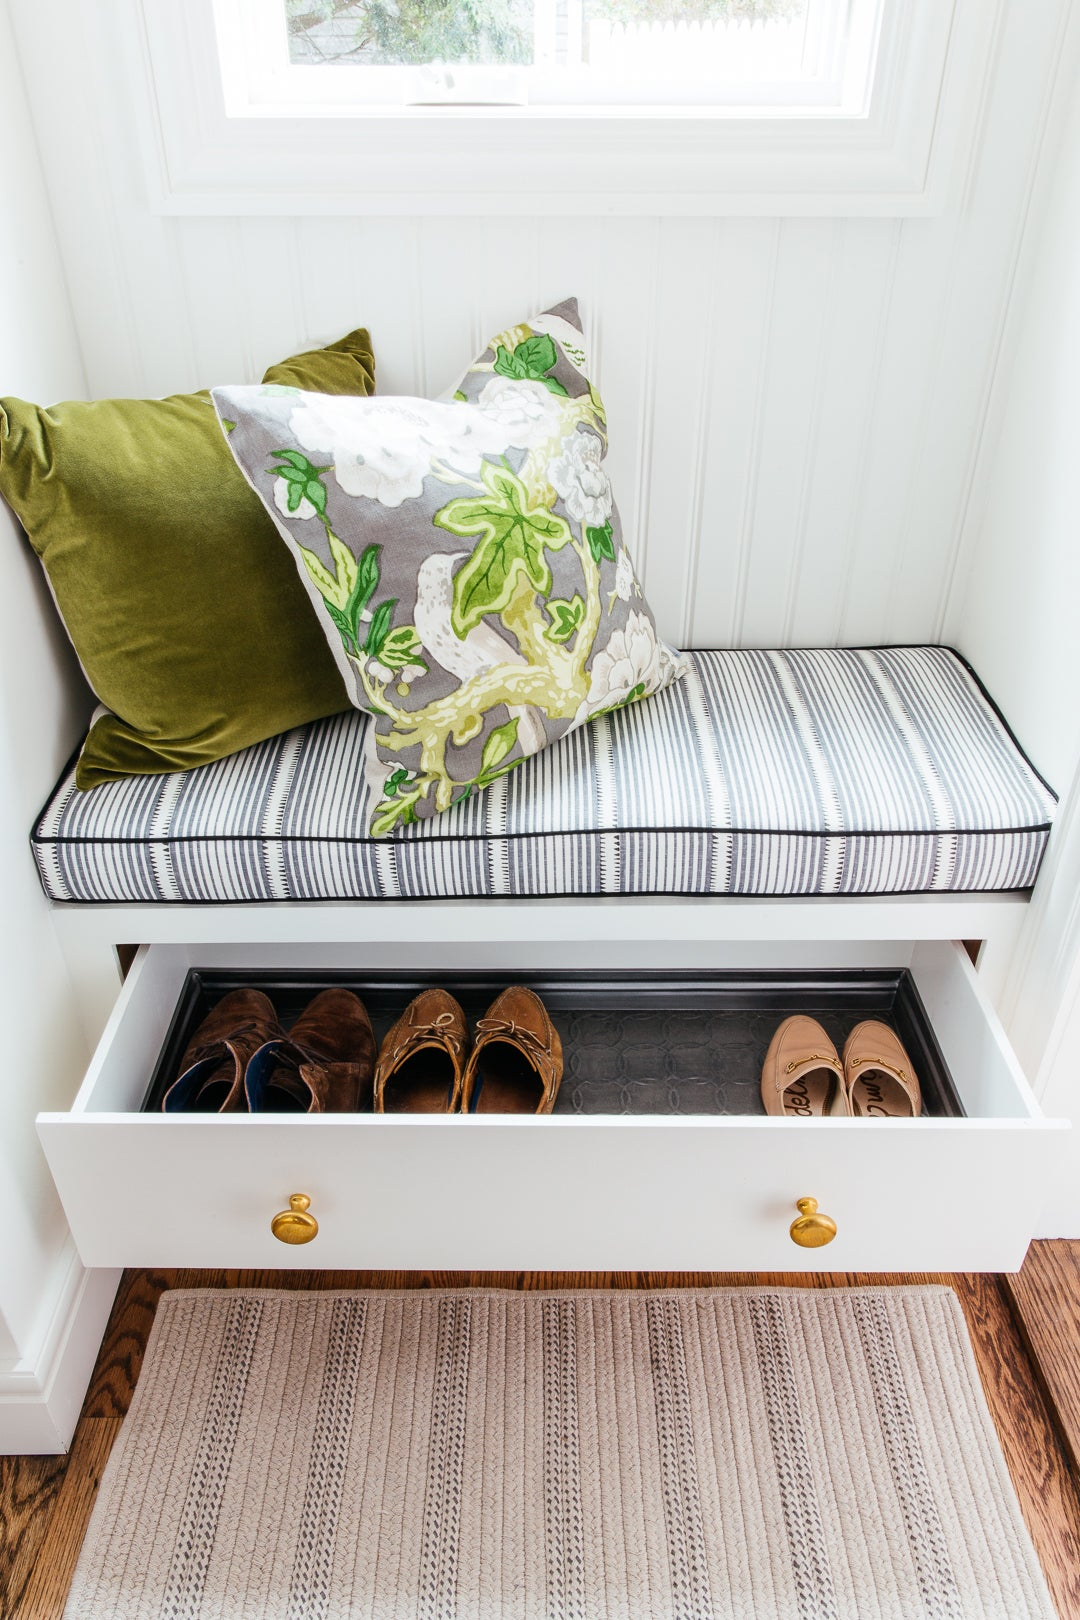 built in bench wiht a drawer half way open